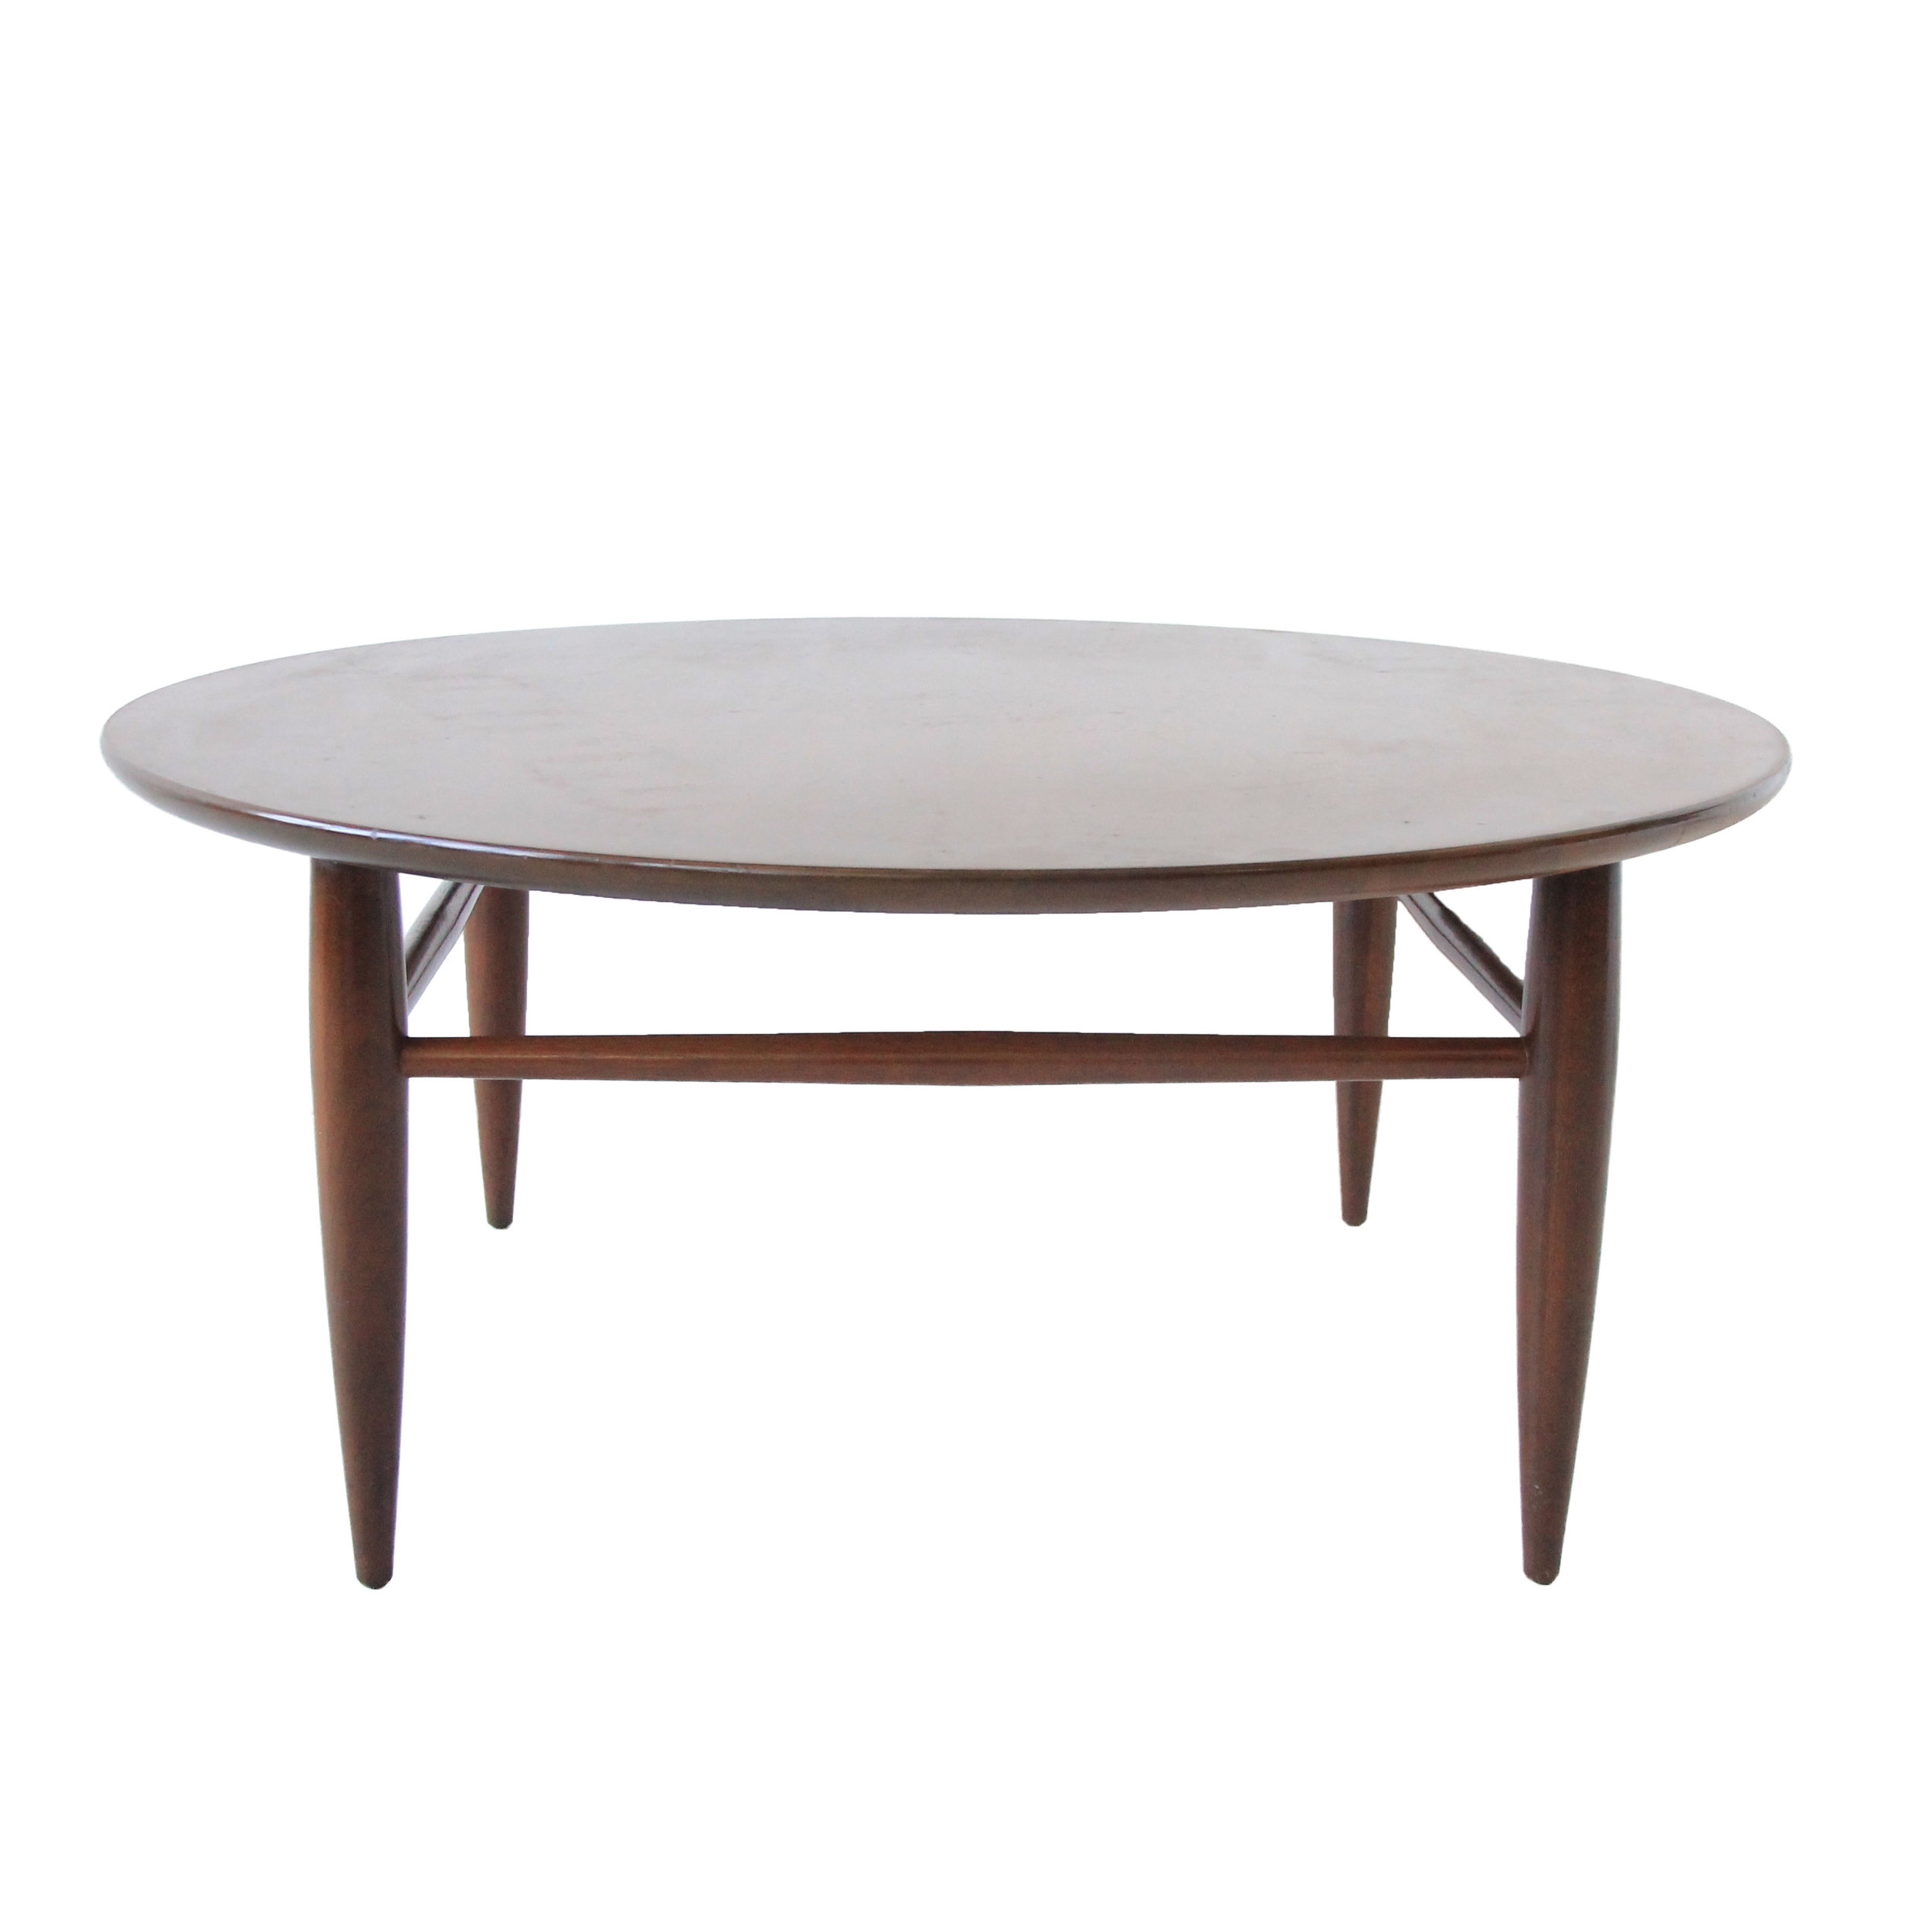 Vintage Mid Century Modern Round Coffee Table